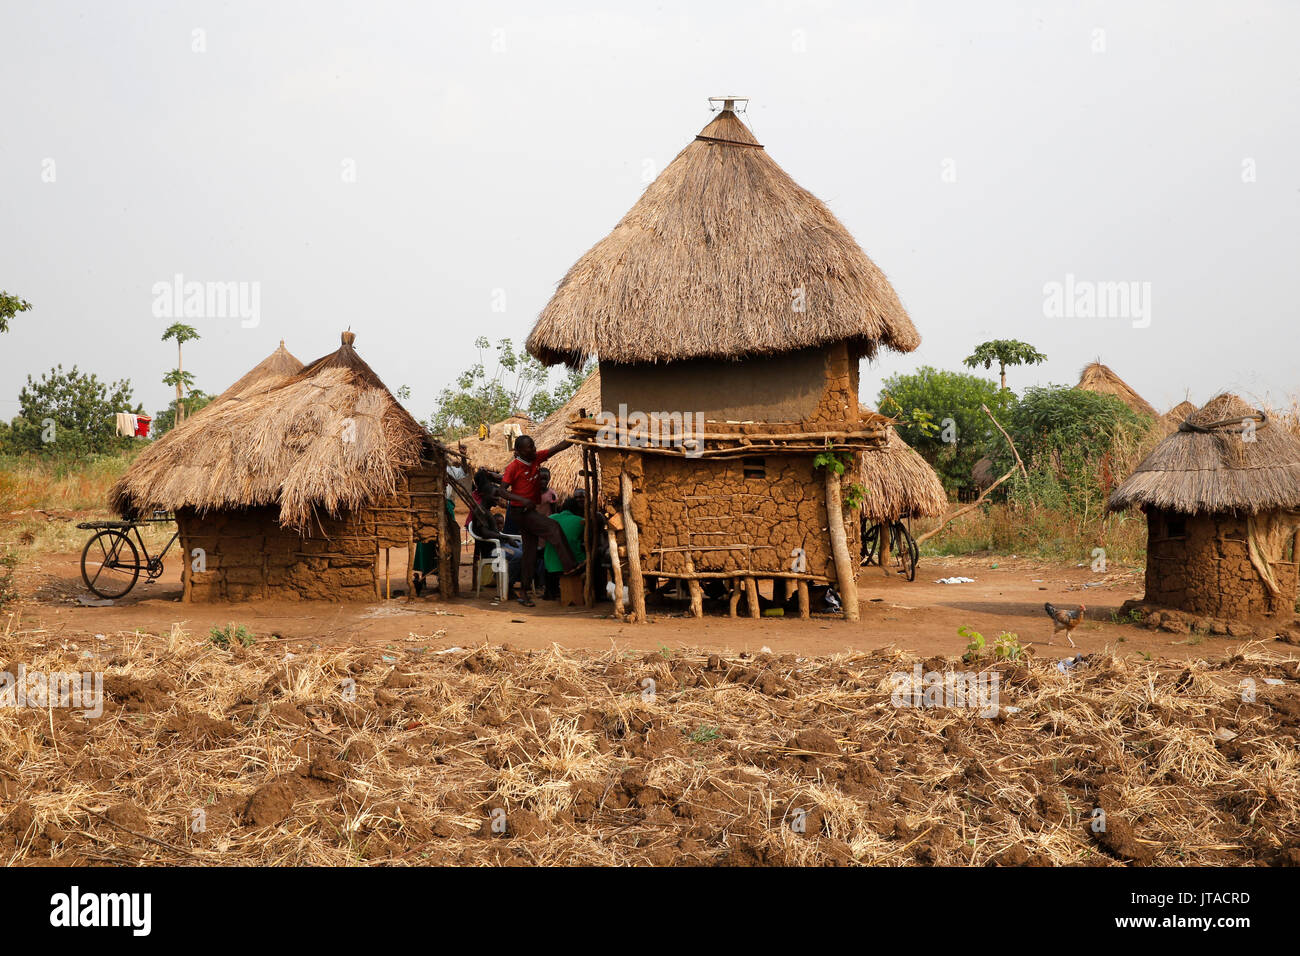 Ugandan village, Uganda, Africa - Stock Image